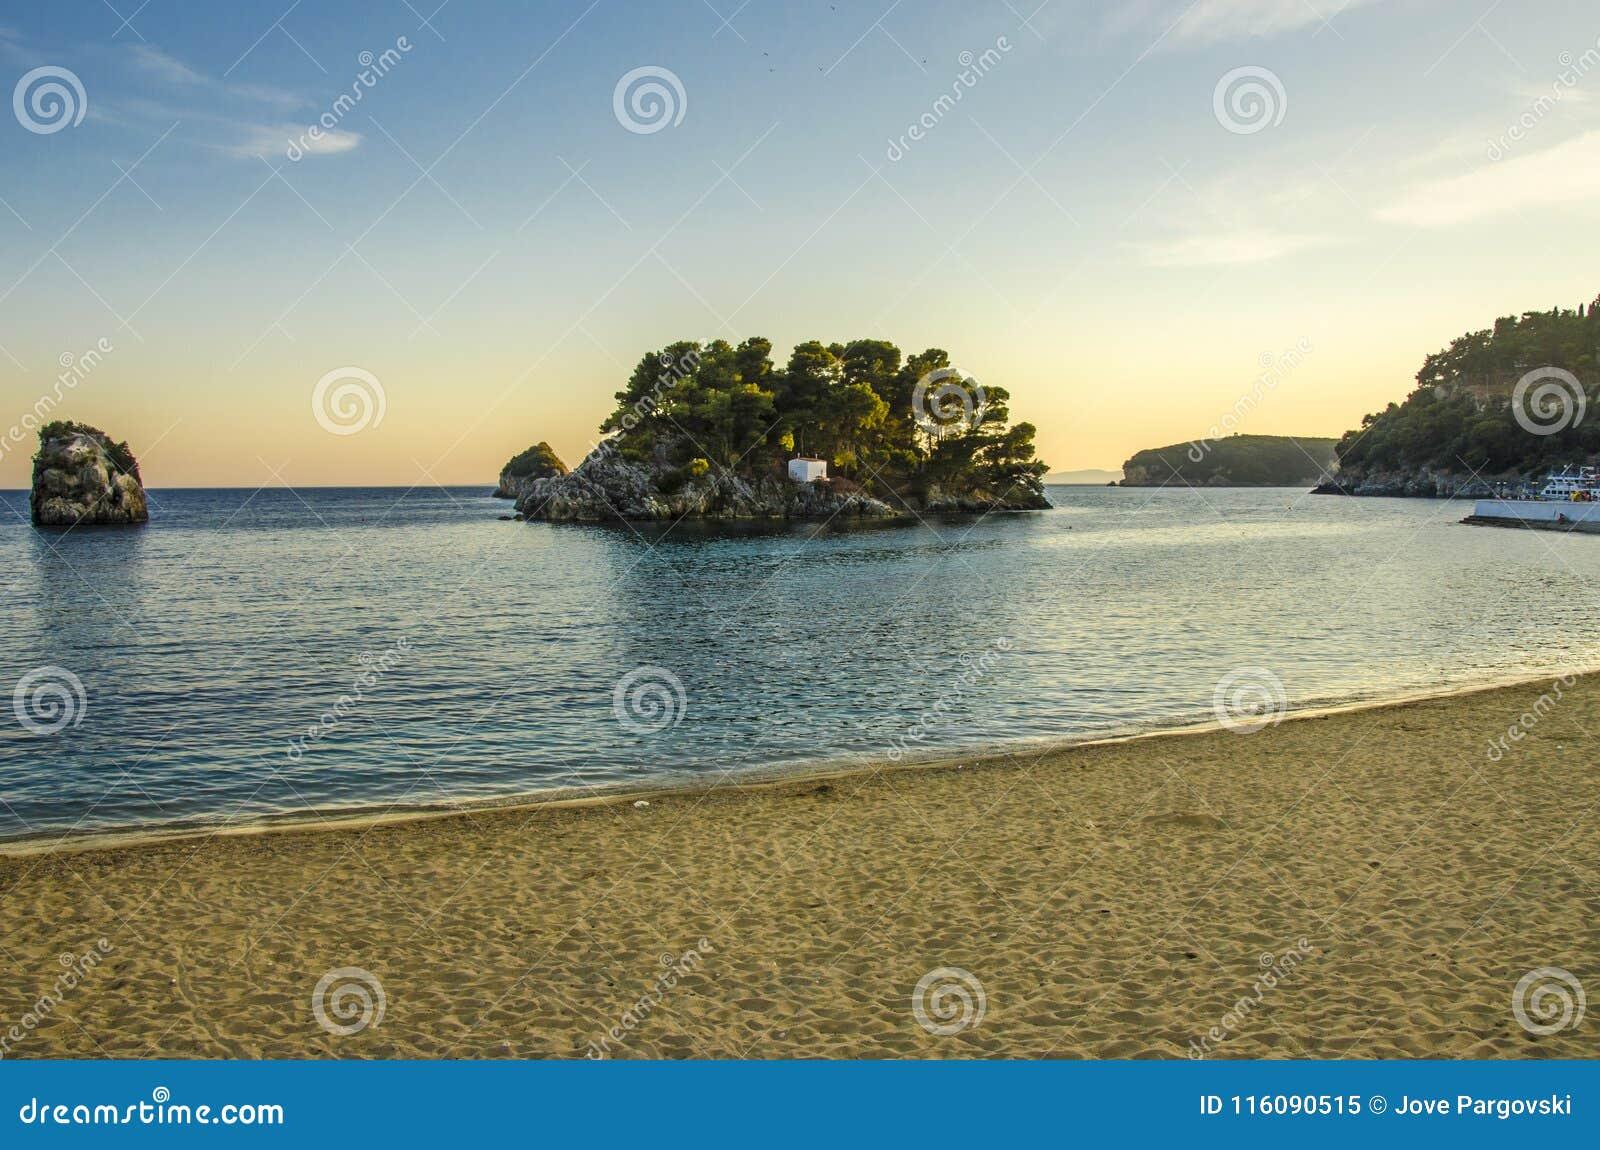 Parga marino ionico, Prevesa, Epiro, Grecia